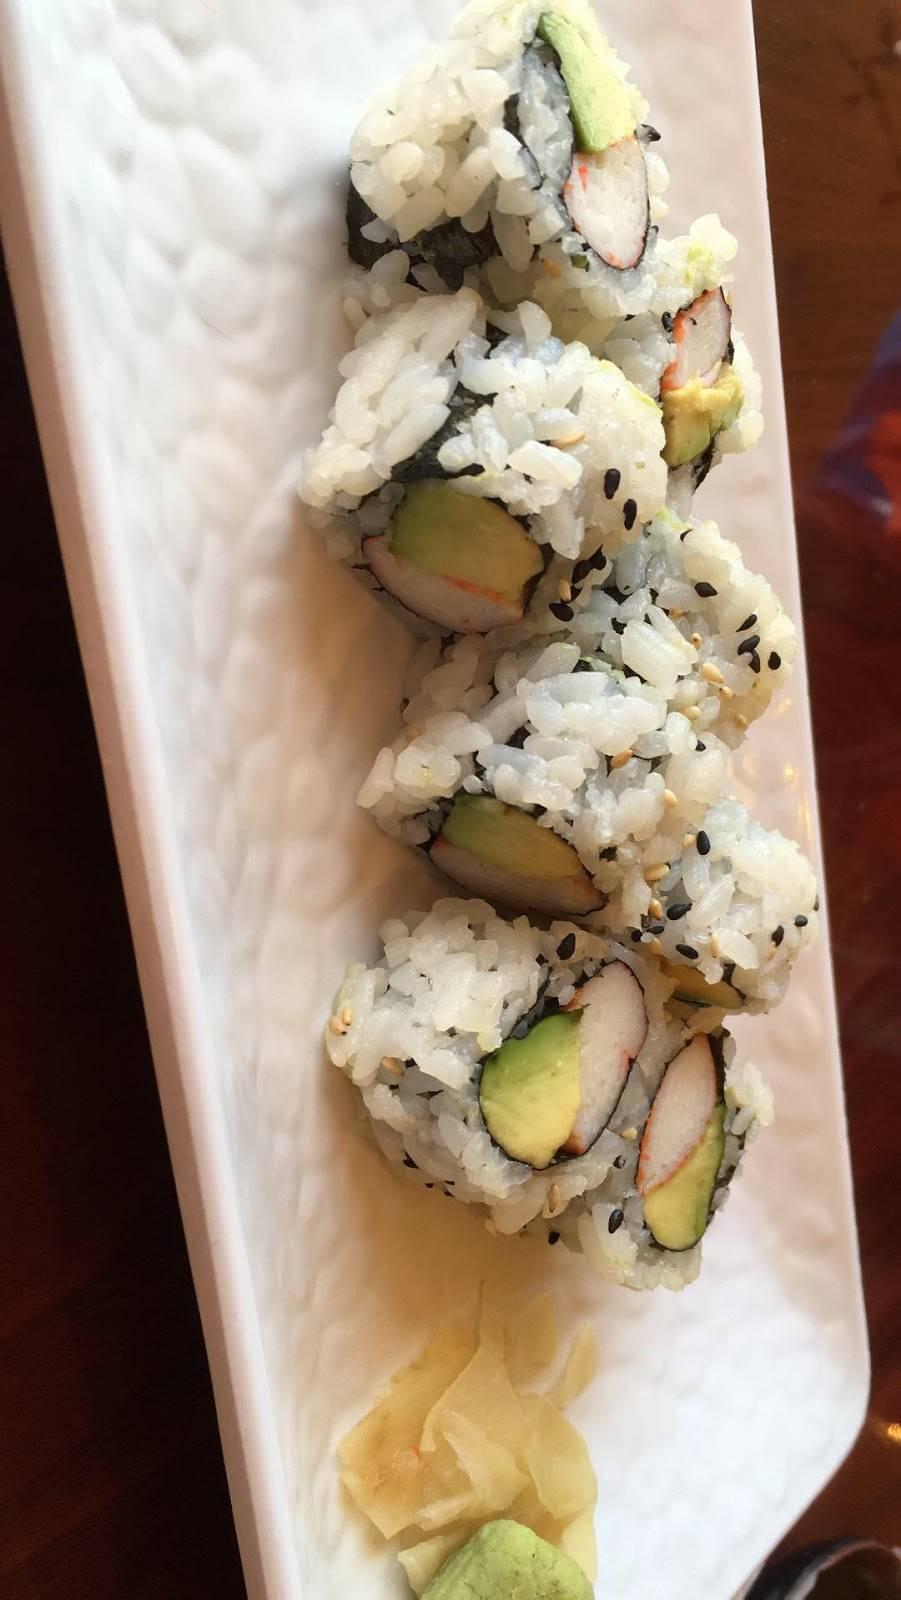 Sushi Island | restaurant | 87-18 Queens Blvd, Elmhurst, NY 11373, USA | 7188033033 OR +1 718-803-3033